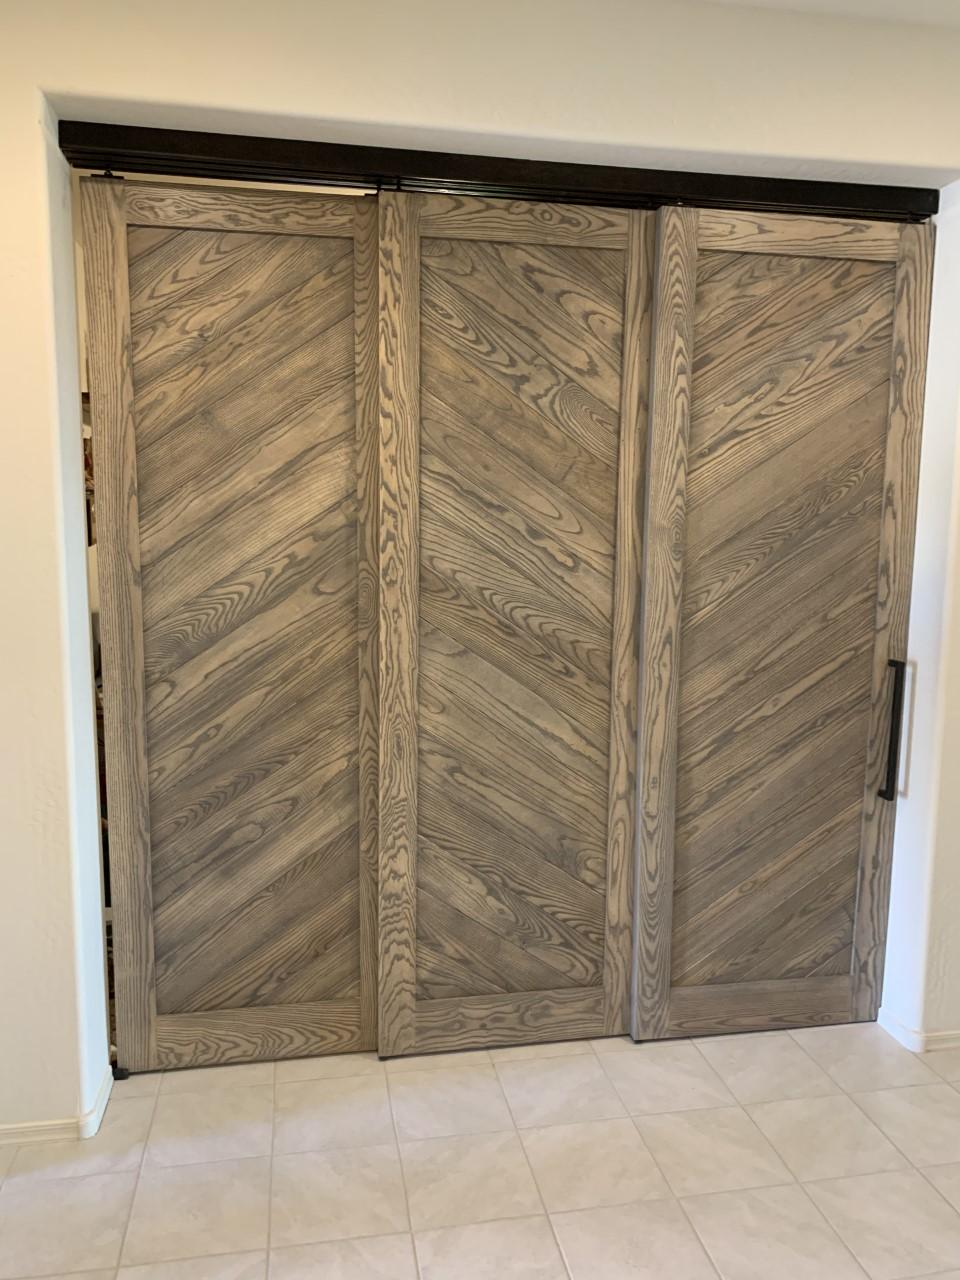 3 solid ash wood bi pass doors